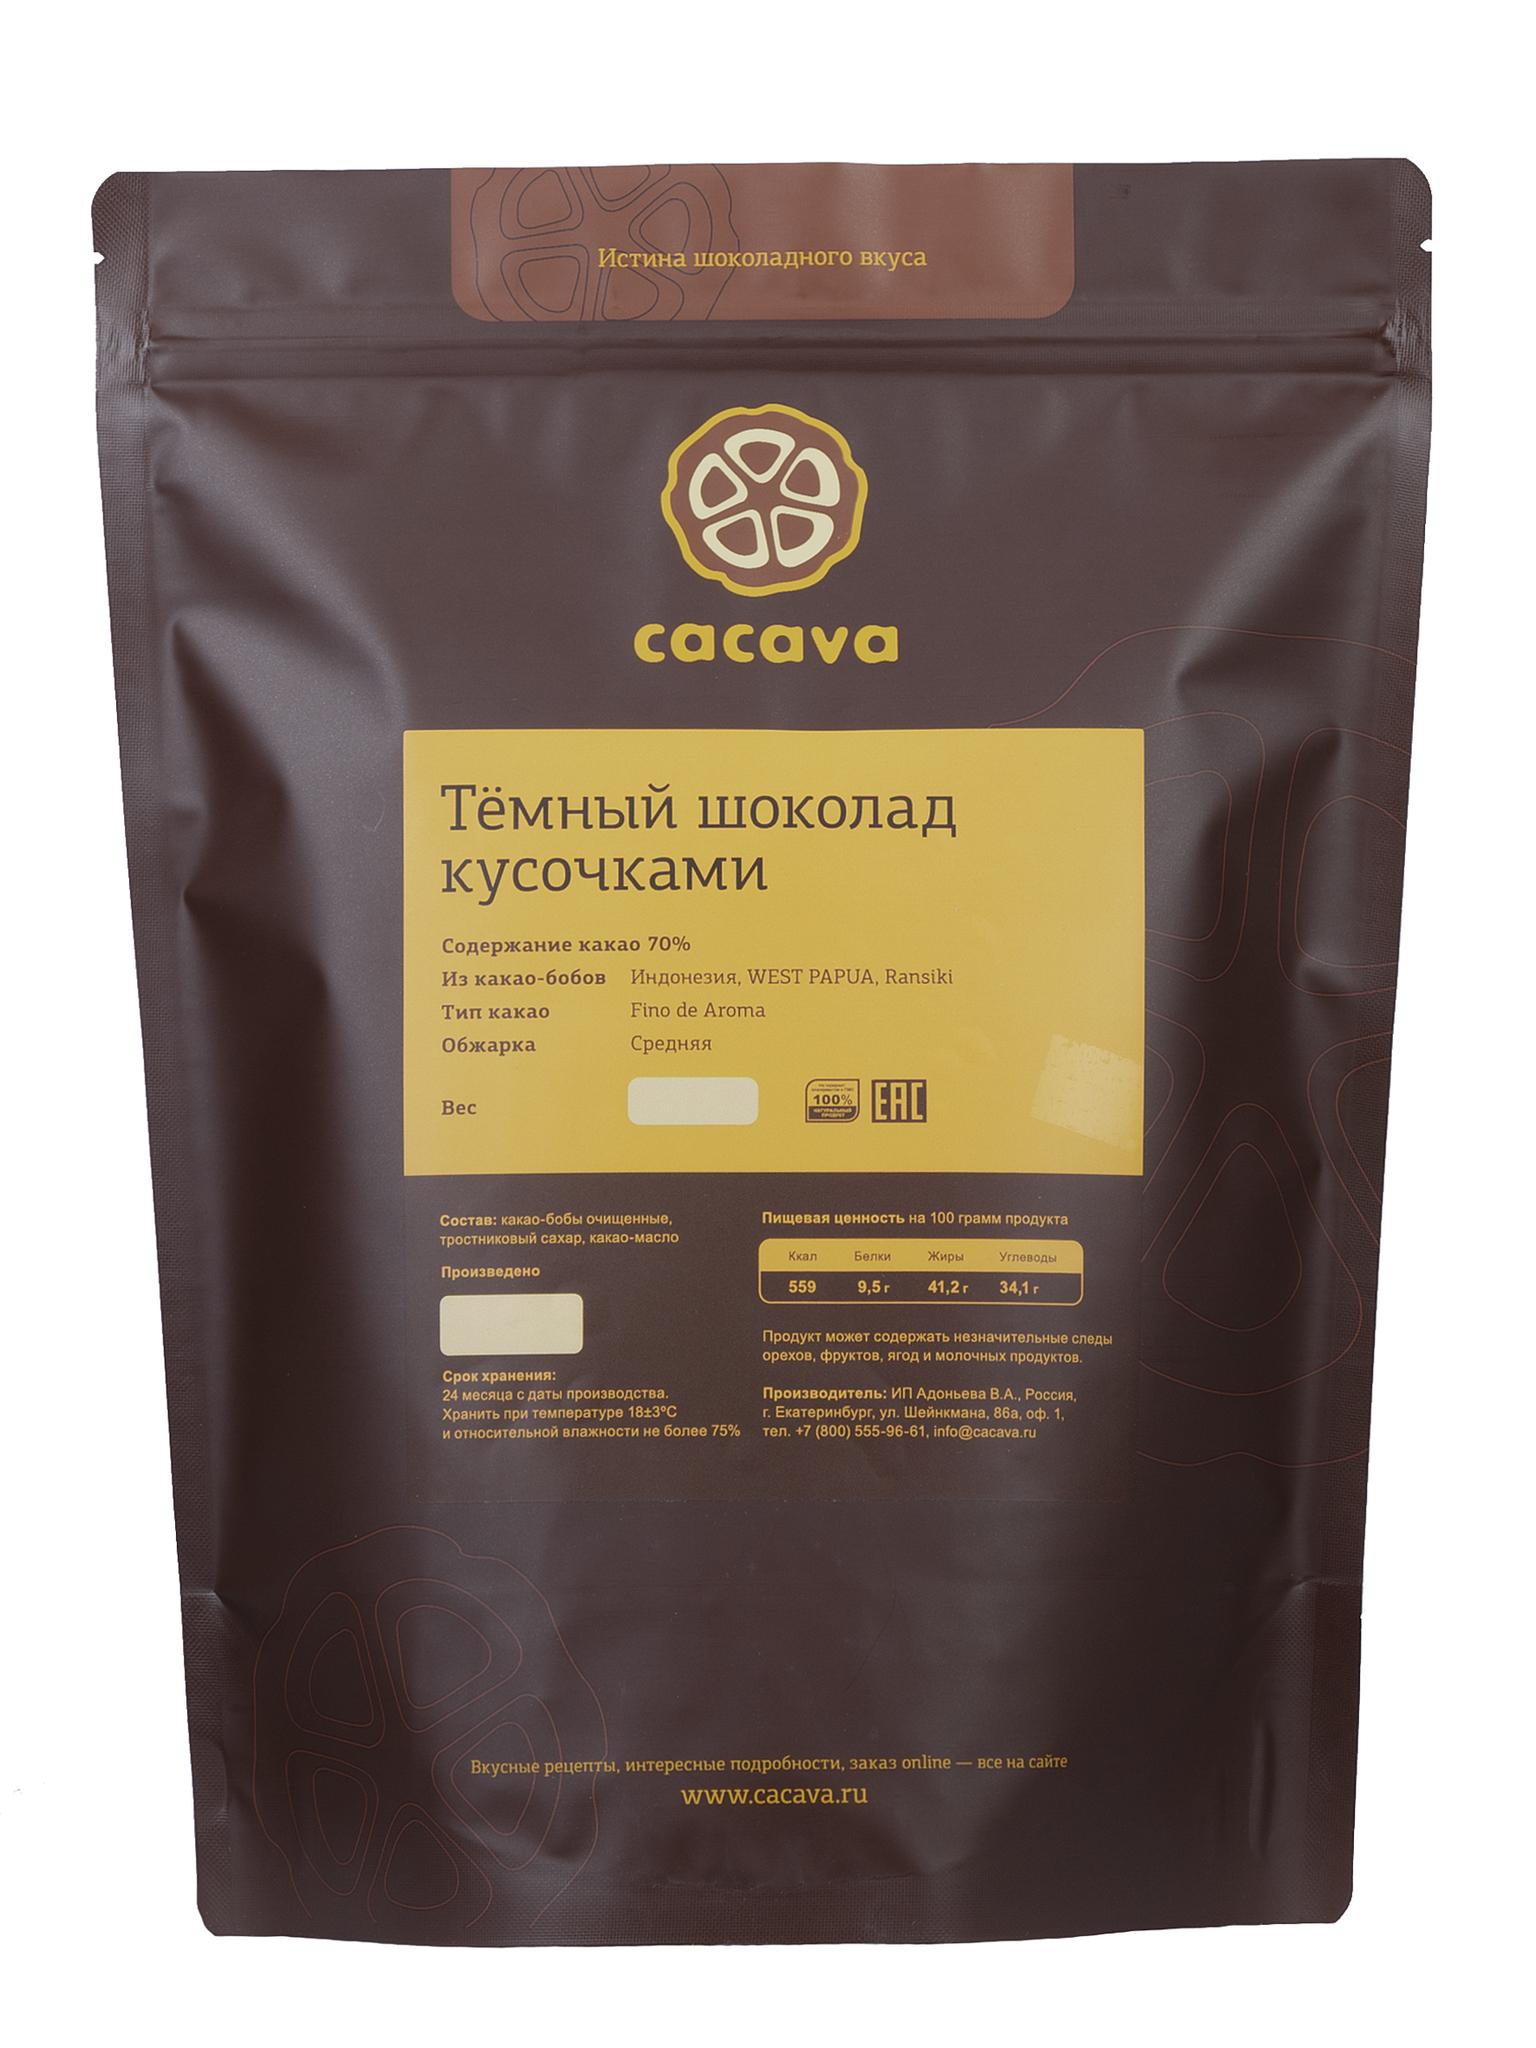 Тёмный шоколад 70 % какао (Индонезия, WEST PAPUA, Ransiki), упаковка 1 кг